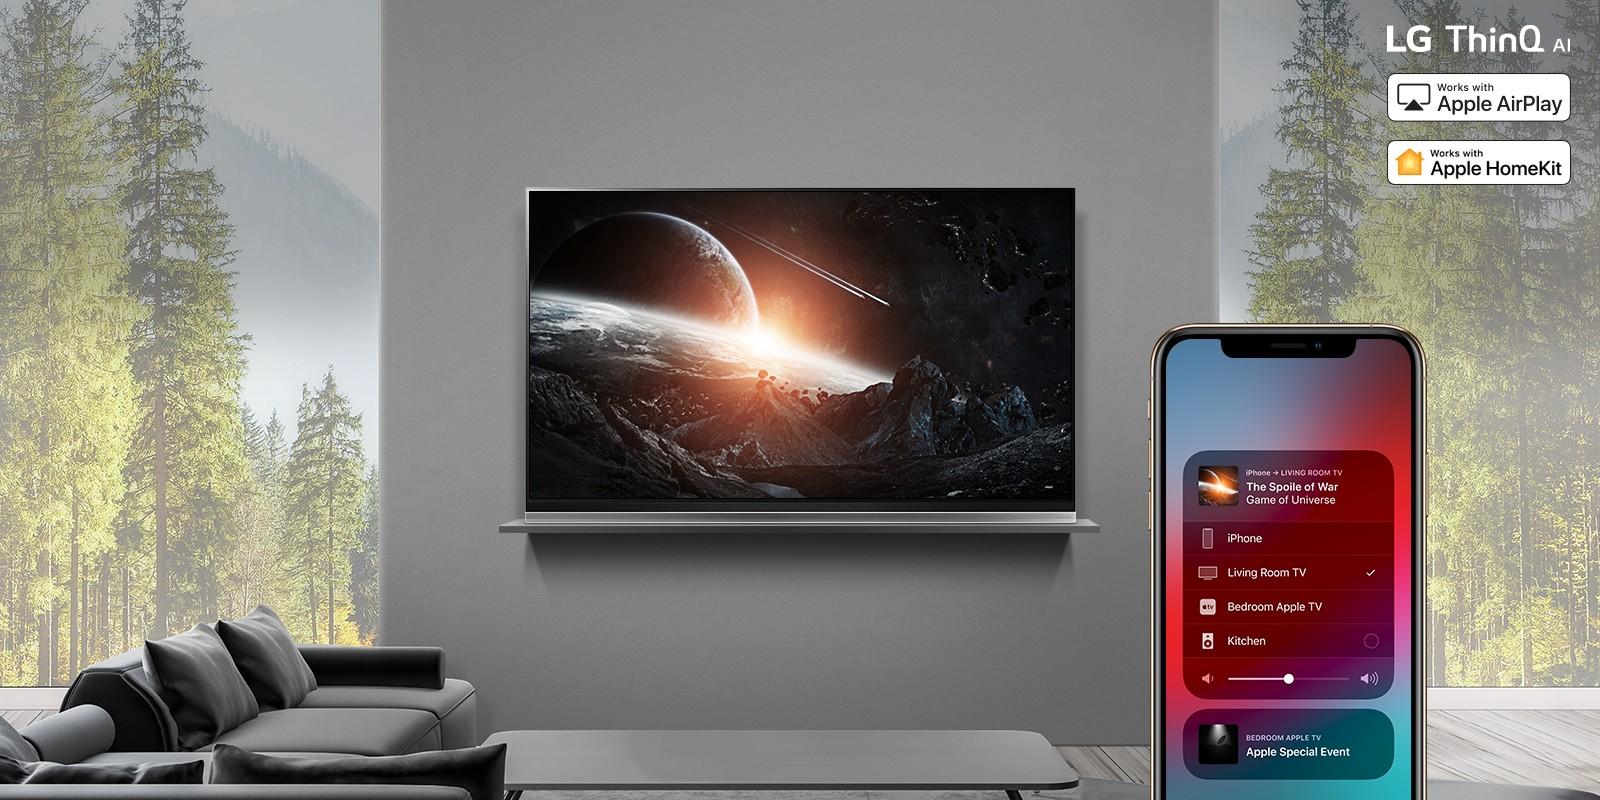 LG Adds Apple AirPlay 2 & HomeKit to Select TVs - Strata-gee com